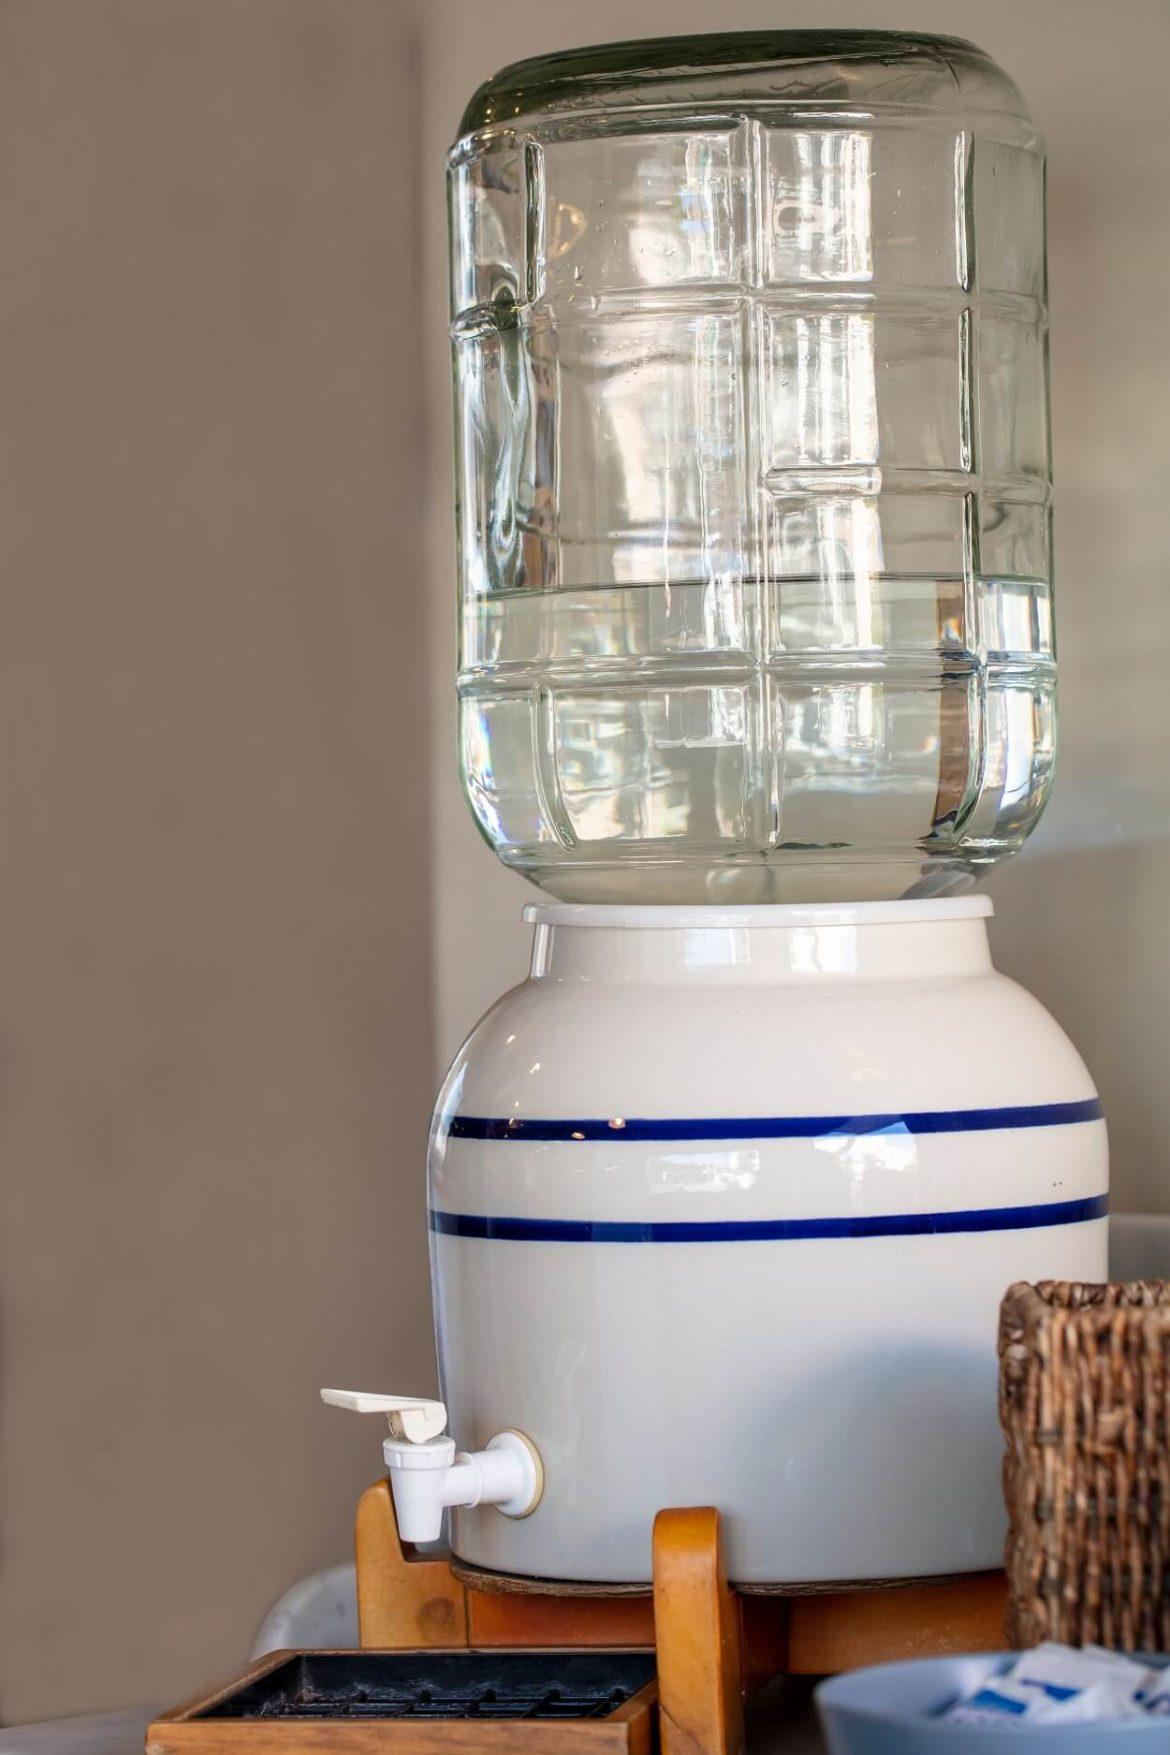 ceramic water dispenser